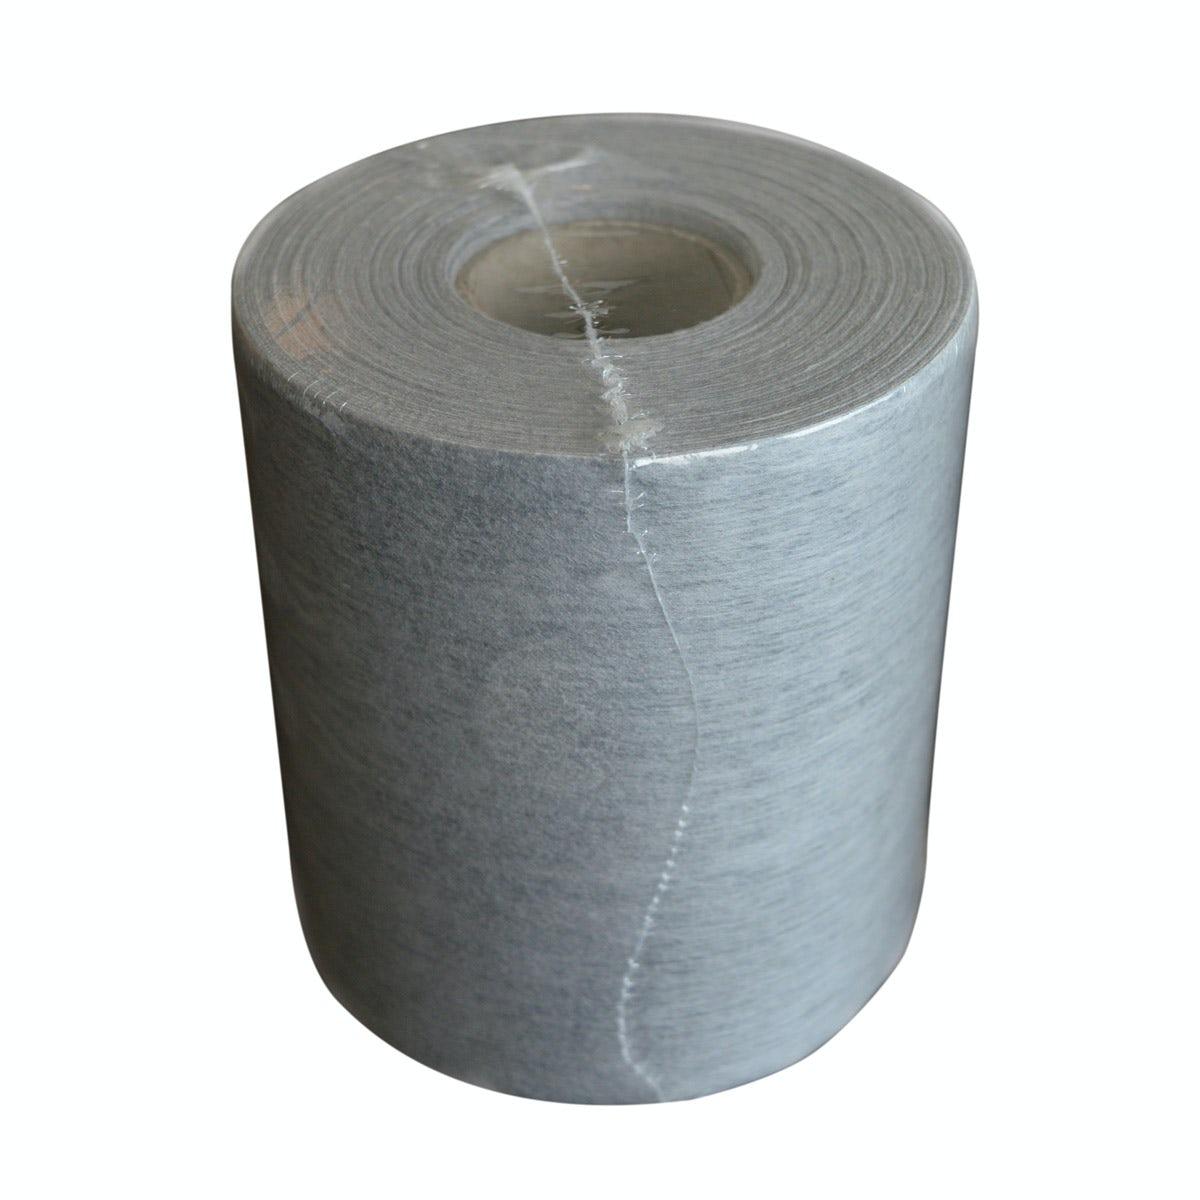 Warmup DCM-Pro waterproofing tape 10m